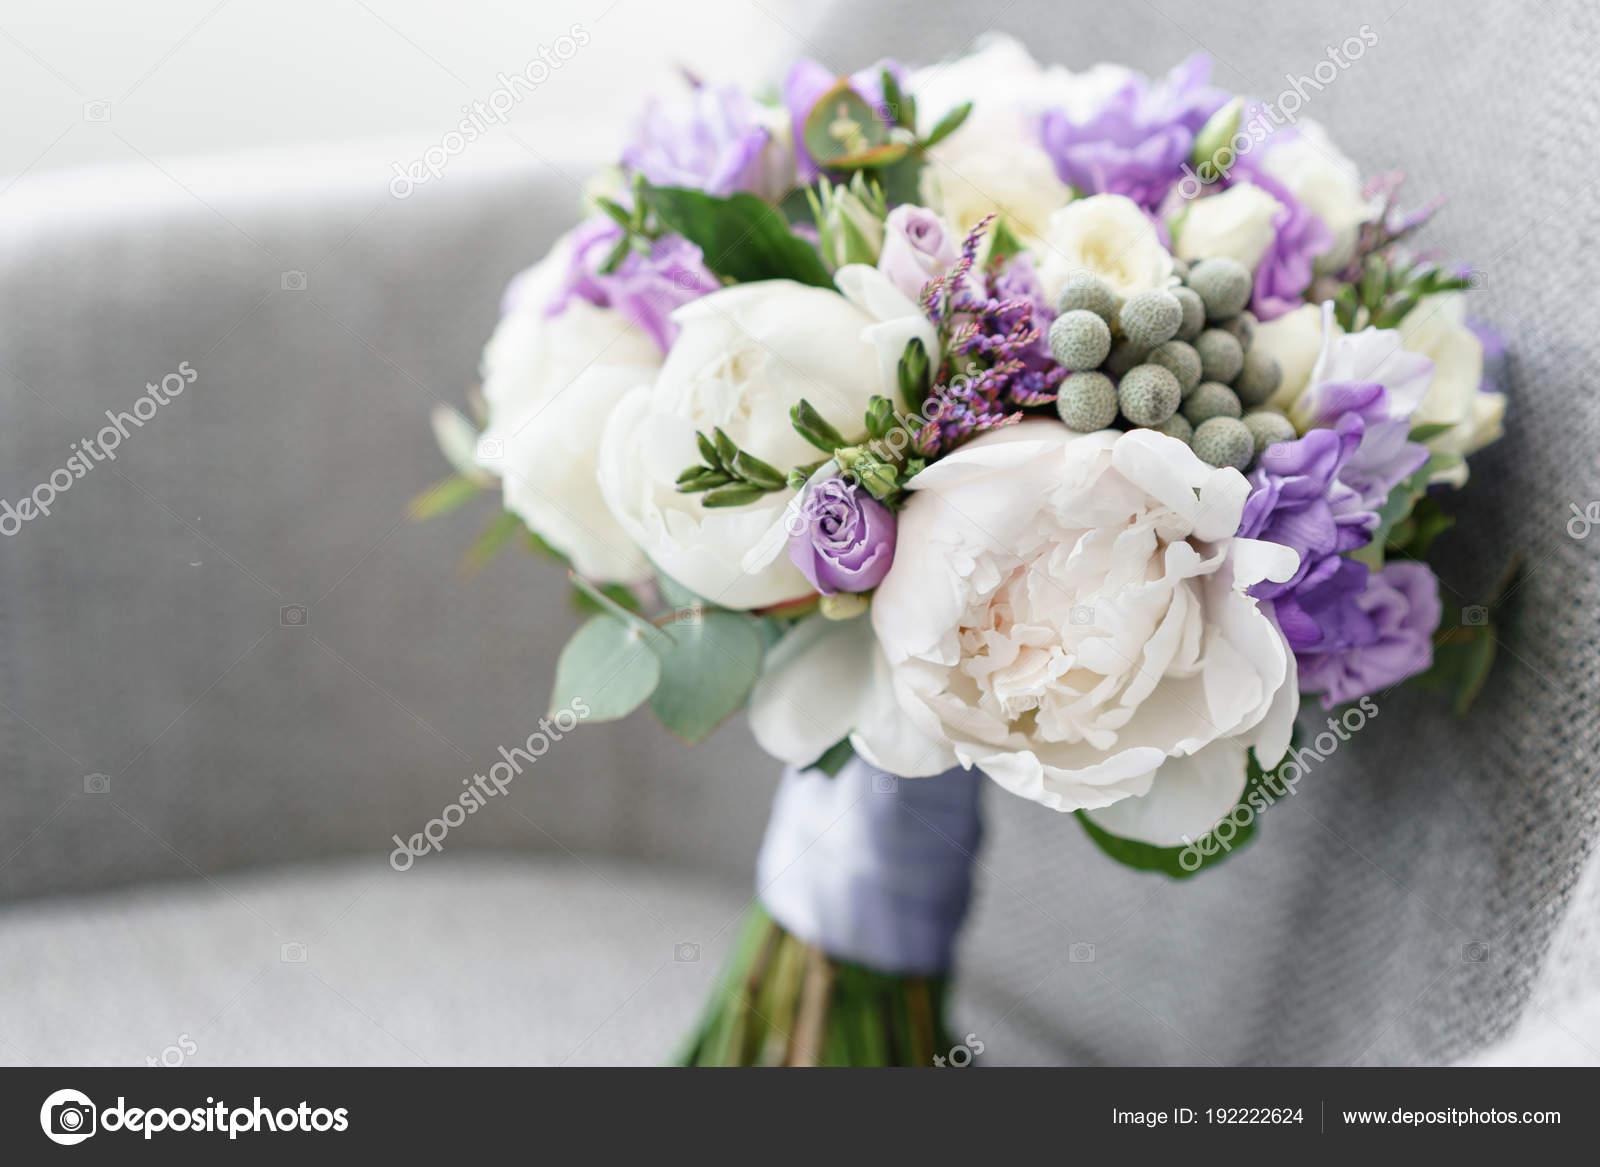 svadebnie-buketi-abhazii-foto-iz-pionov